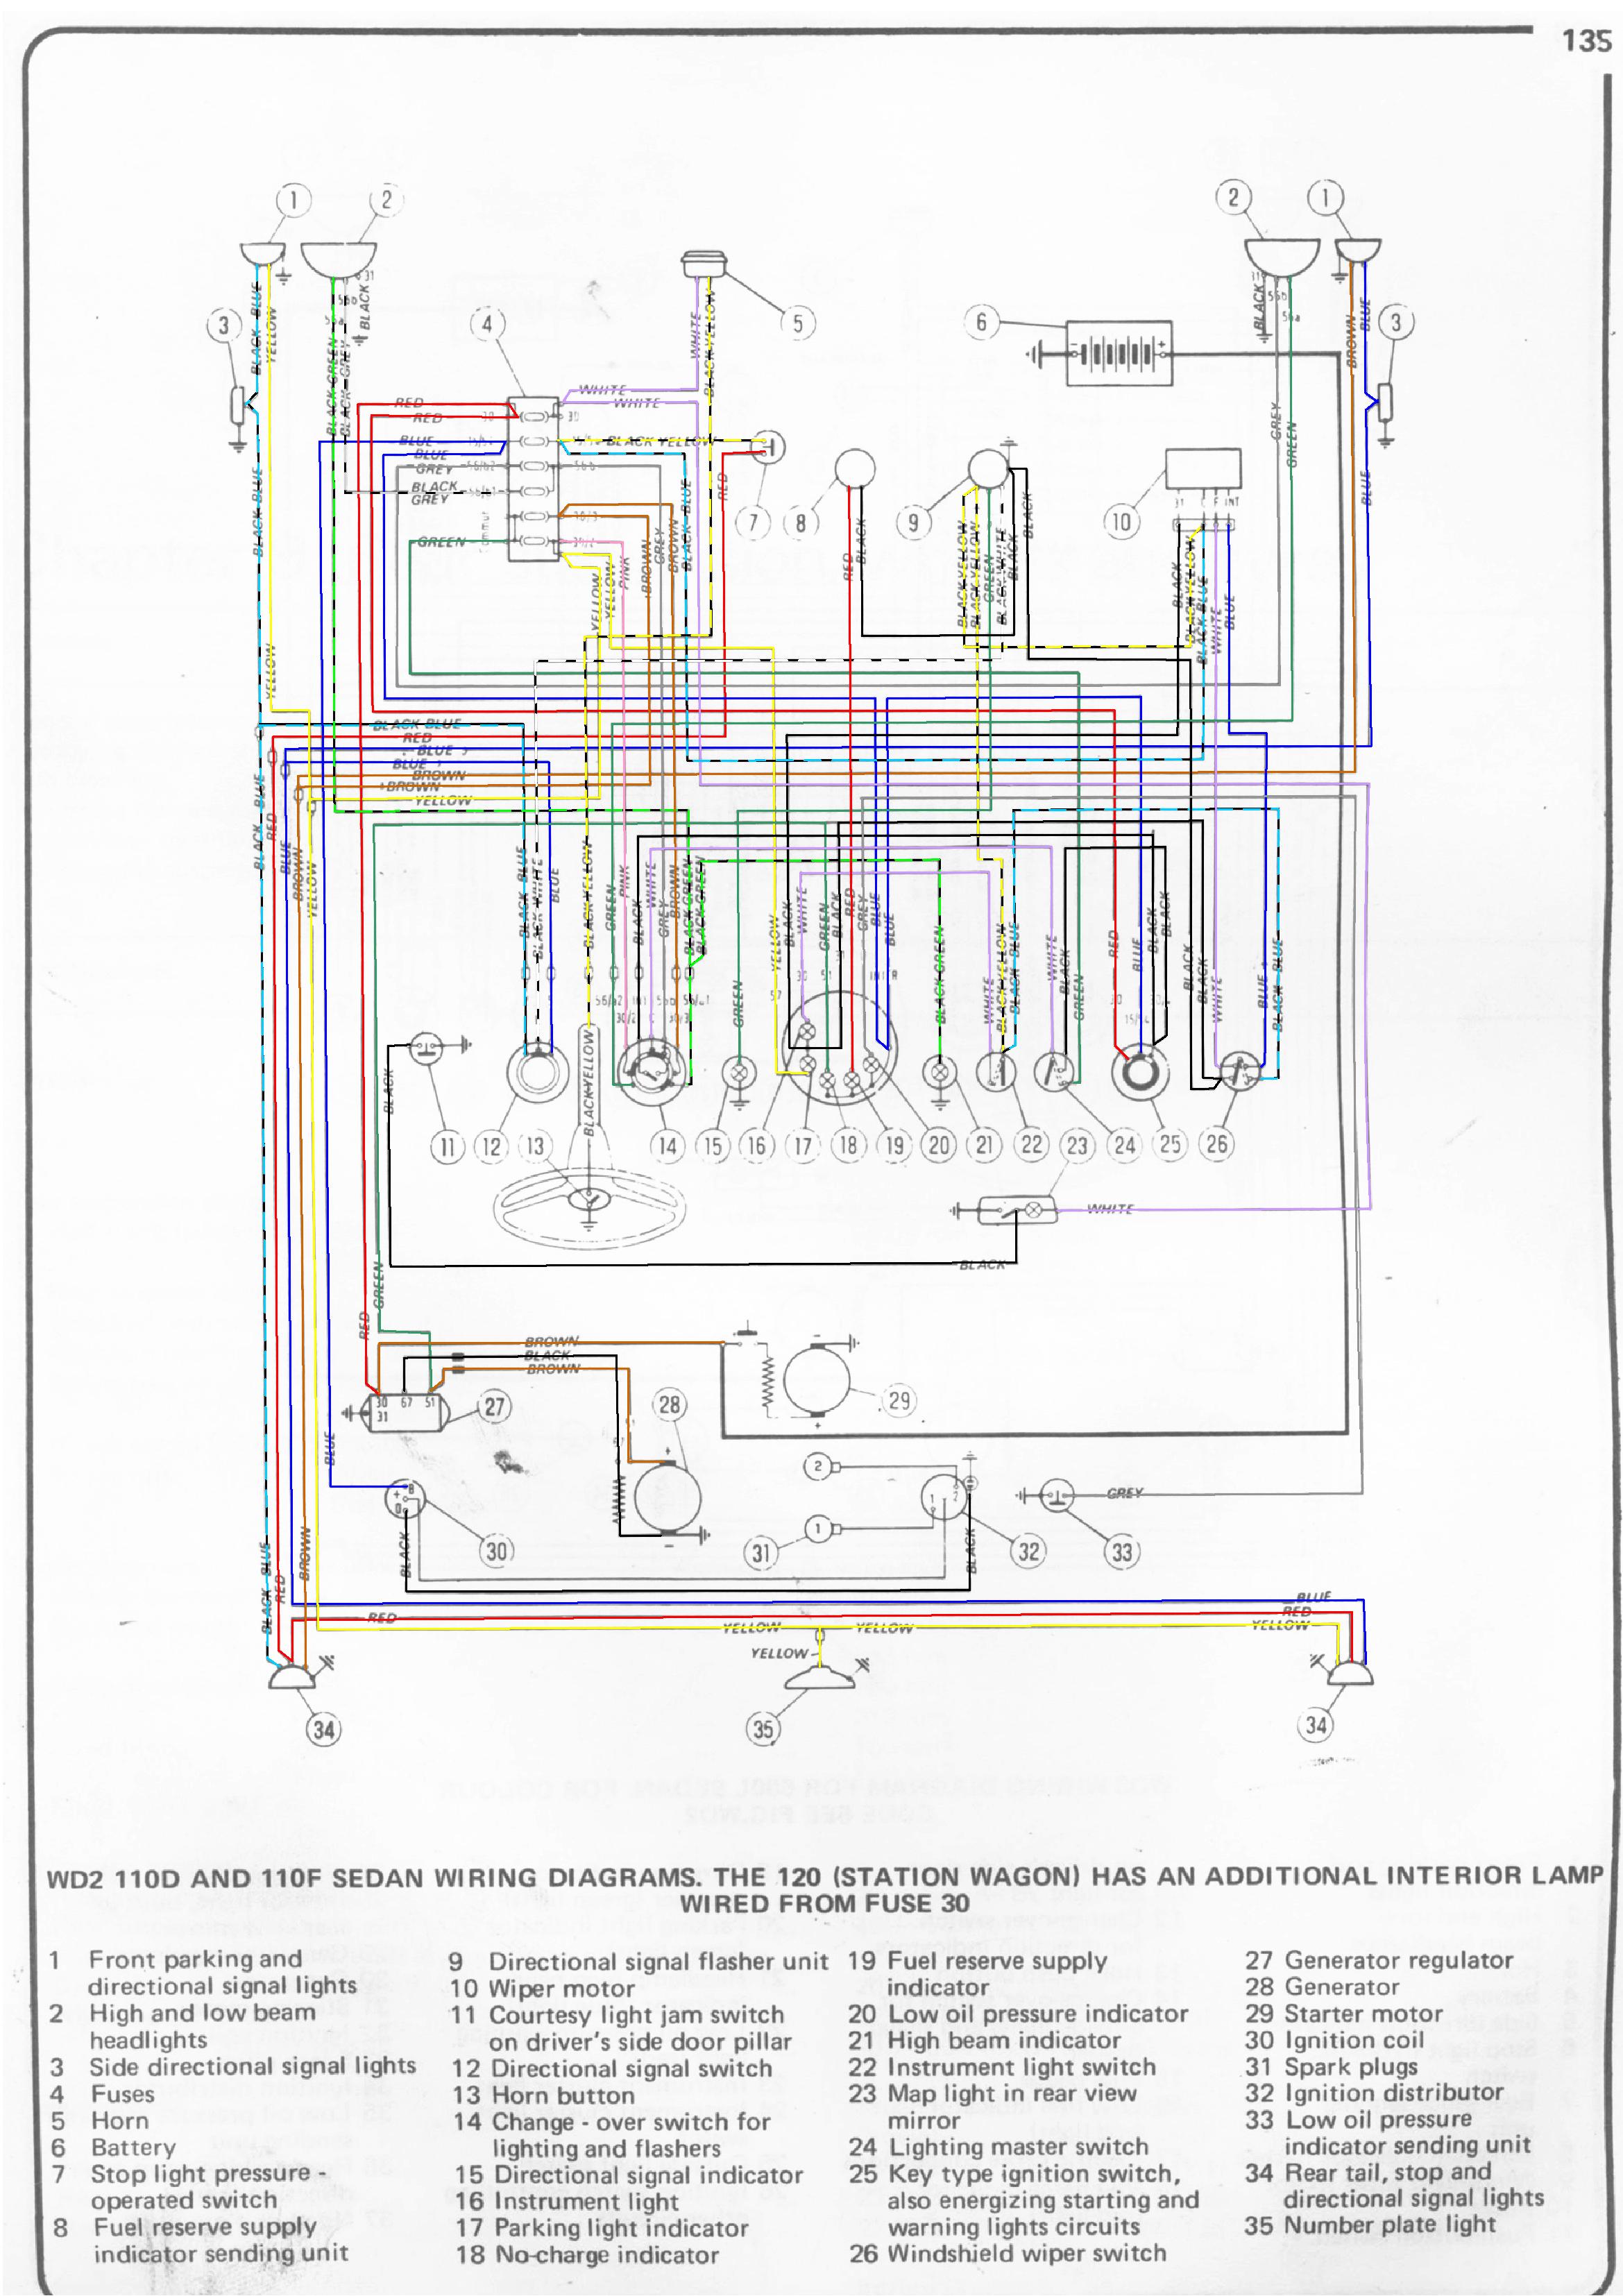 fiat wiring diagrams wiring diagram third level rh 10 14 jacobwinterstein com mitsubishi starion wiring diagram [ 2339 x 3309 Pixel ]